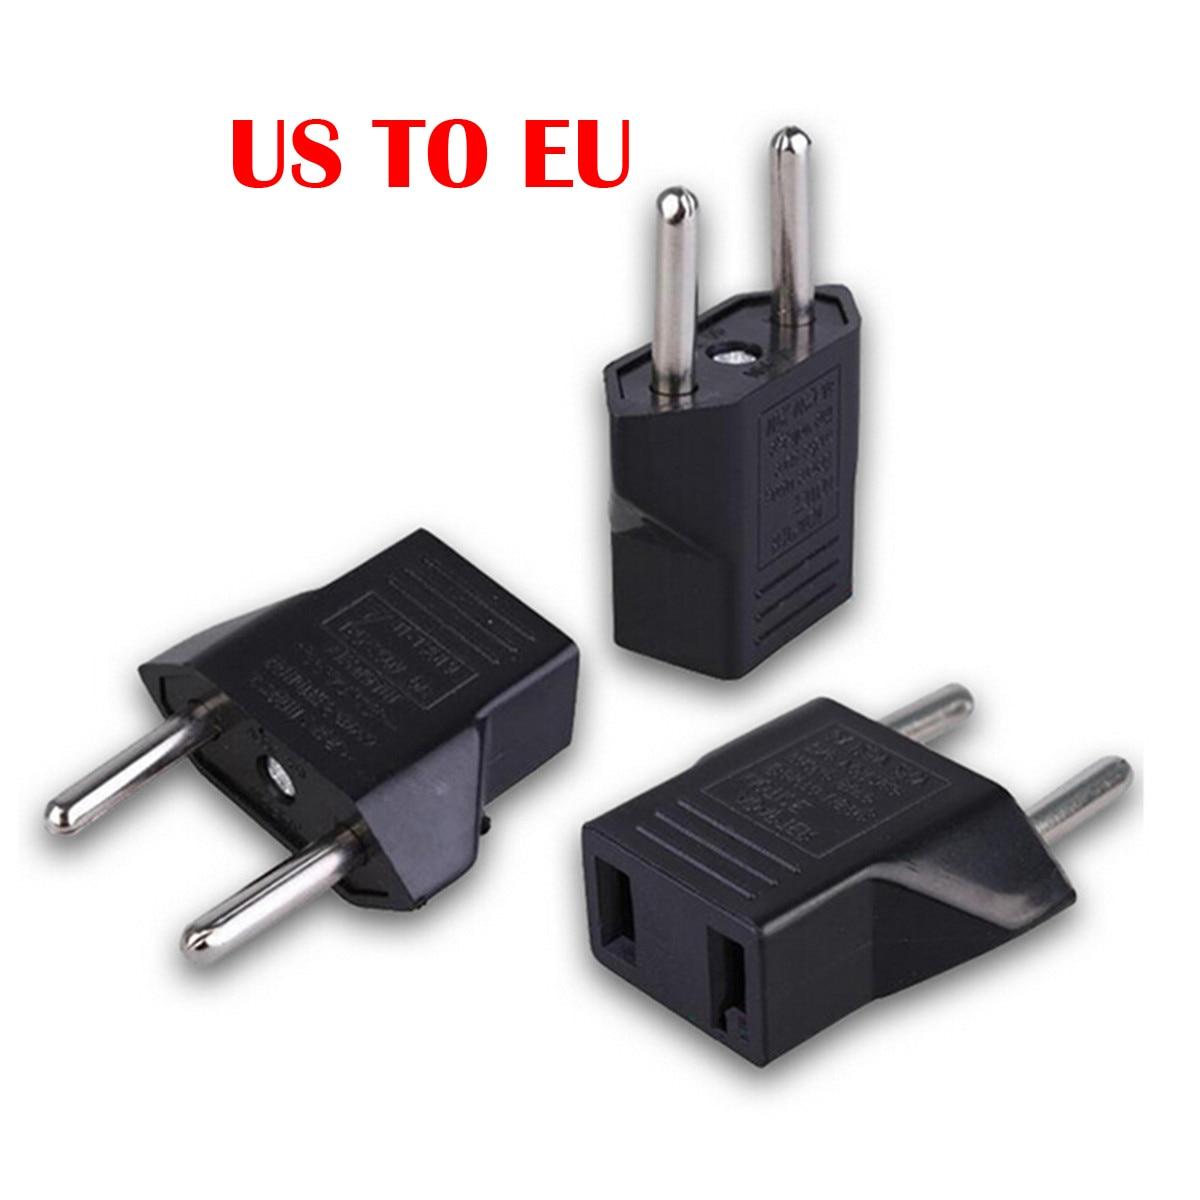 to US Plug Adapters 2 round pin 2 flat pin US-PLUG x 5: Lot of 5 European